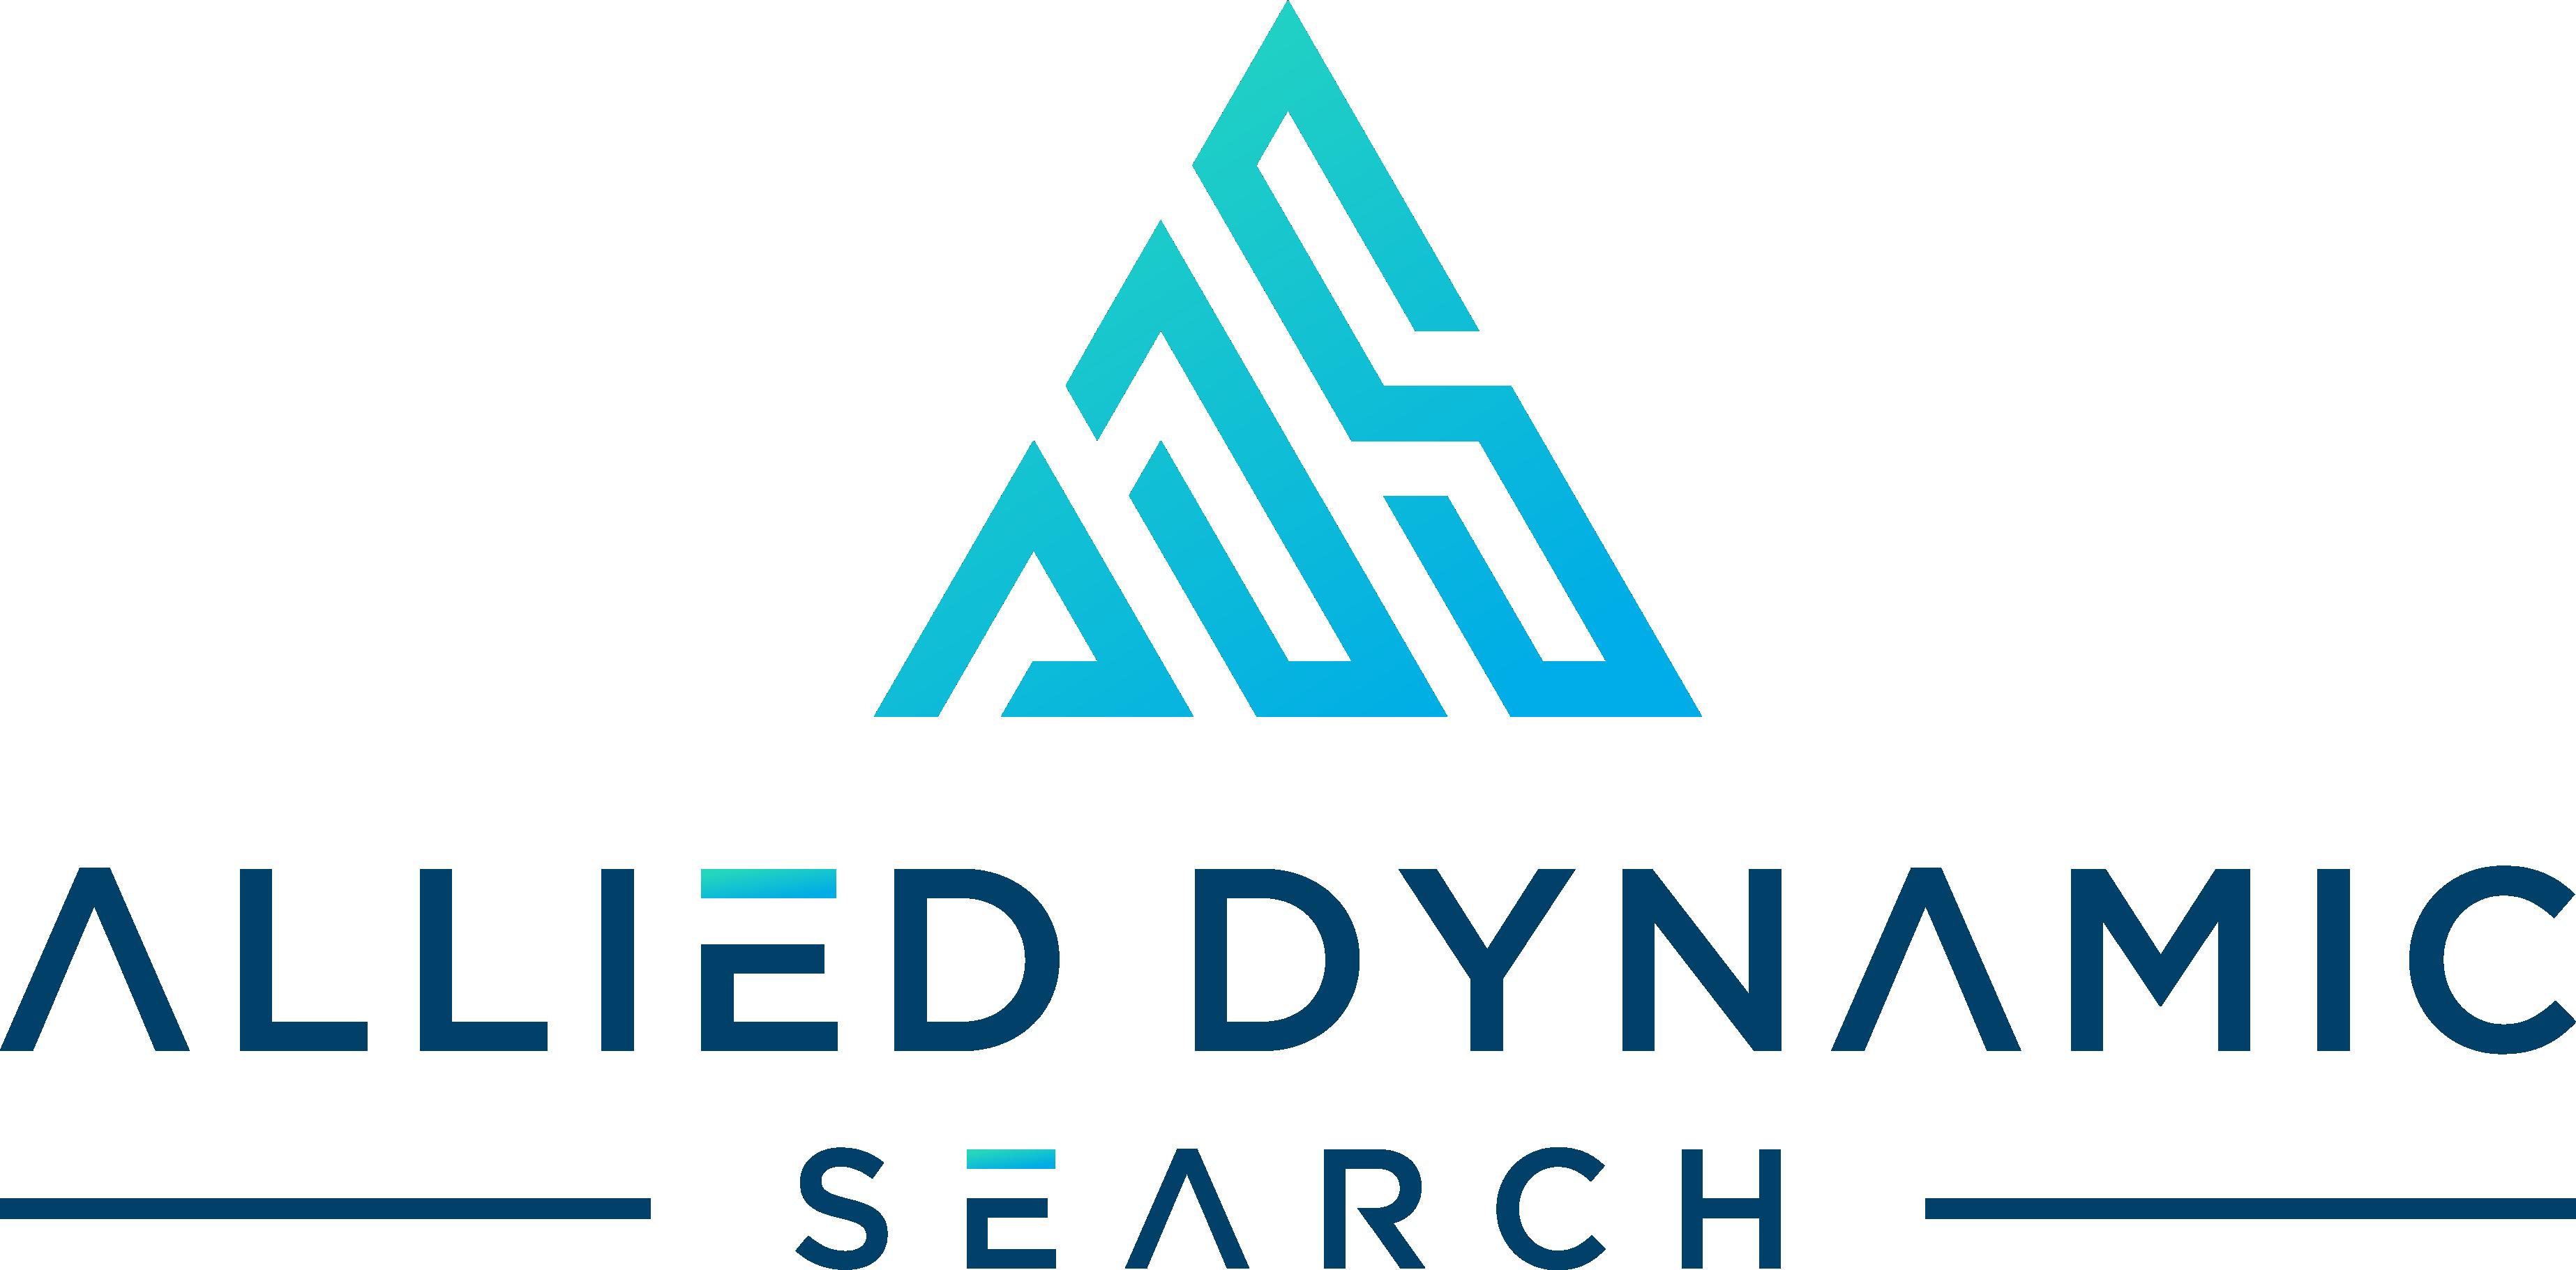 Allied Dynamic Search logo